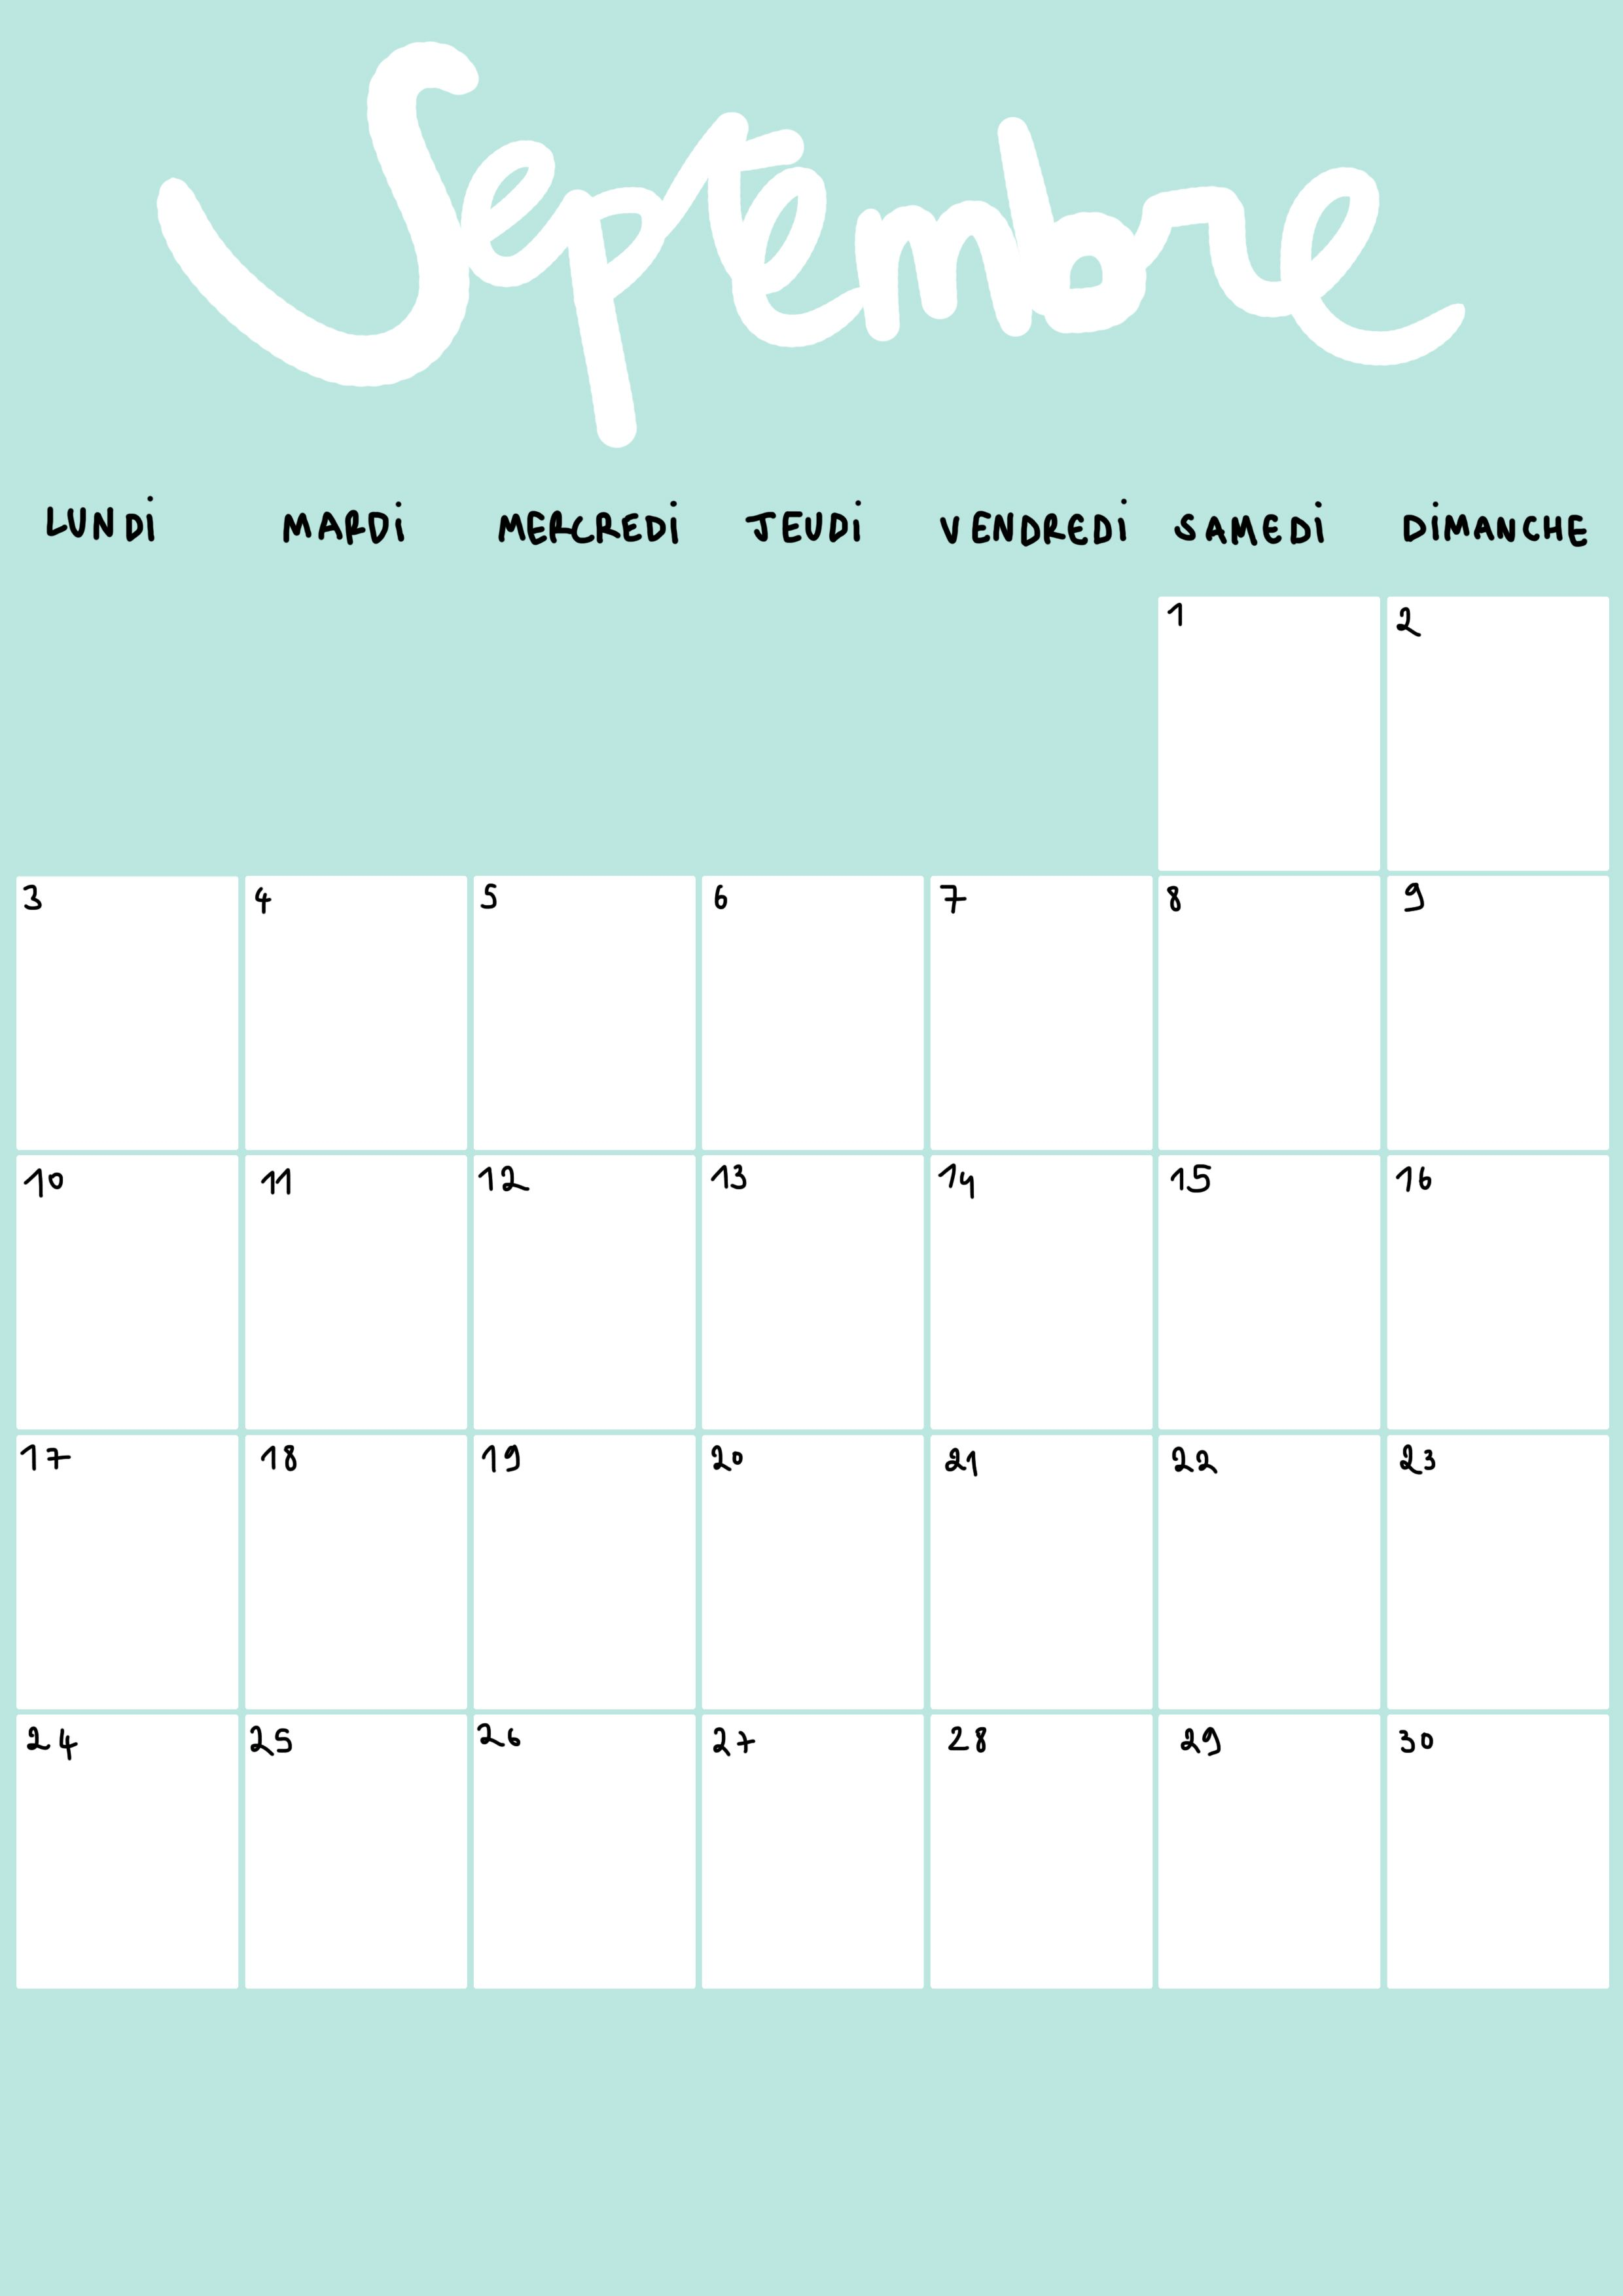 Calendrier Mois De Septembre.Calendrier Du Mois De Septembre 2018 A Imprimer Calendrier